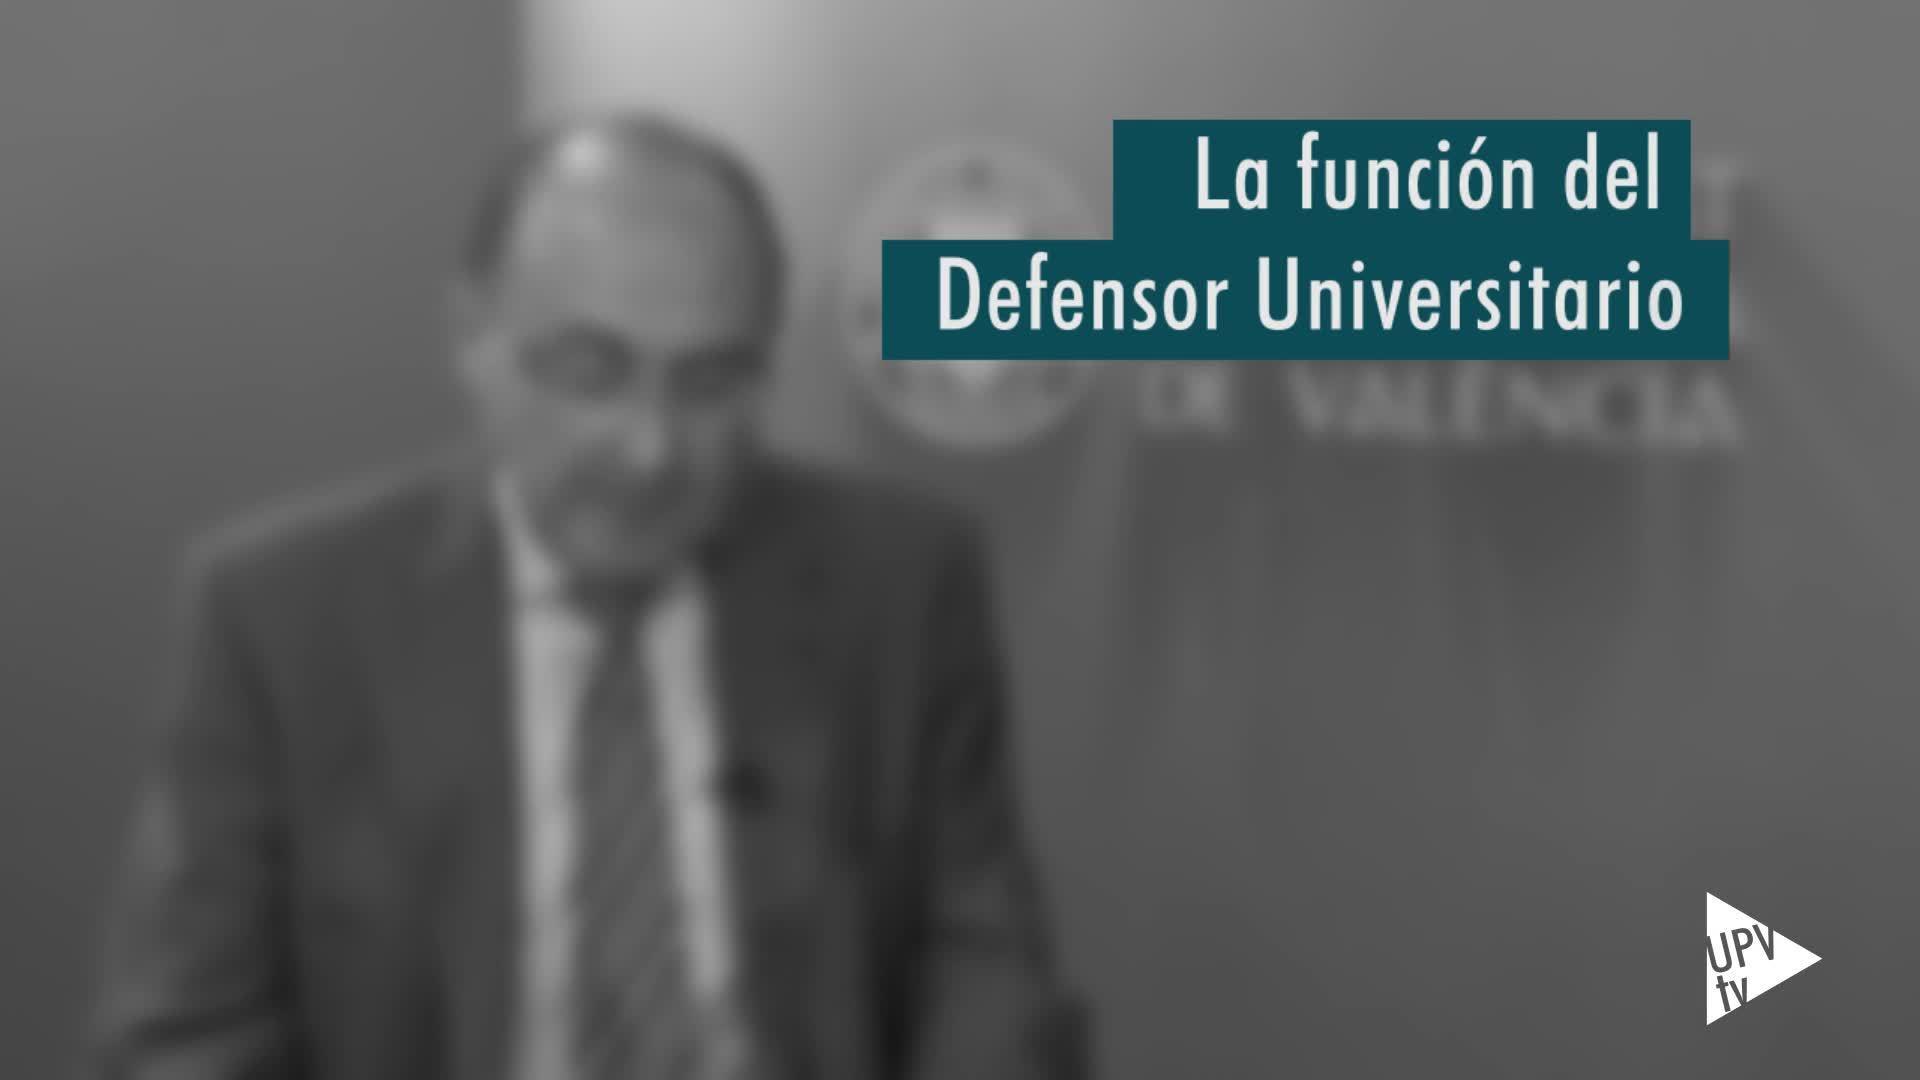 08-04-2016 Defensor Universitario UPV